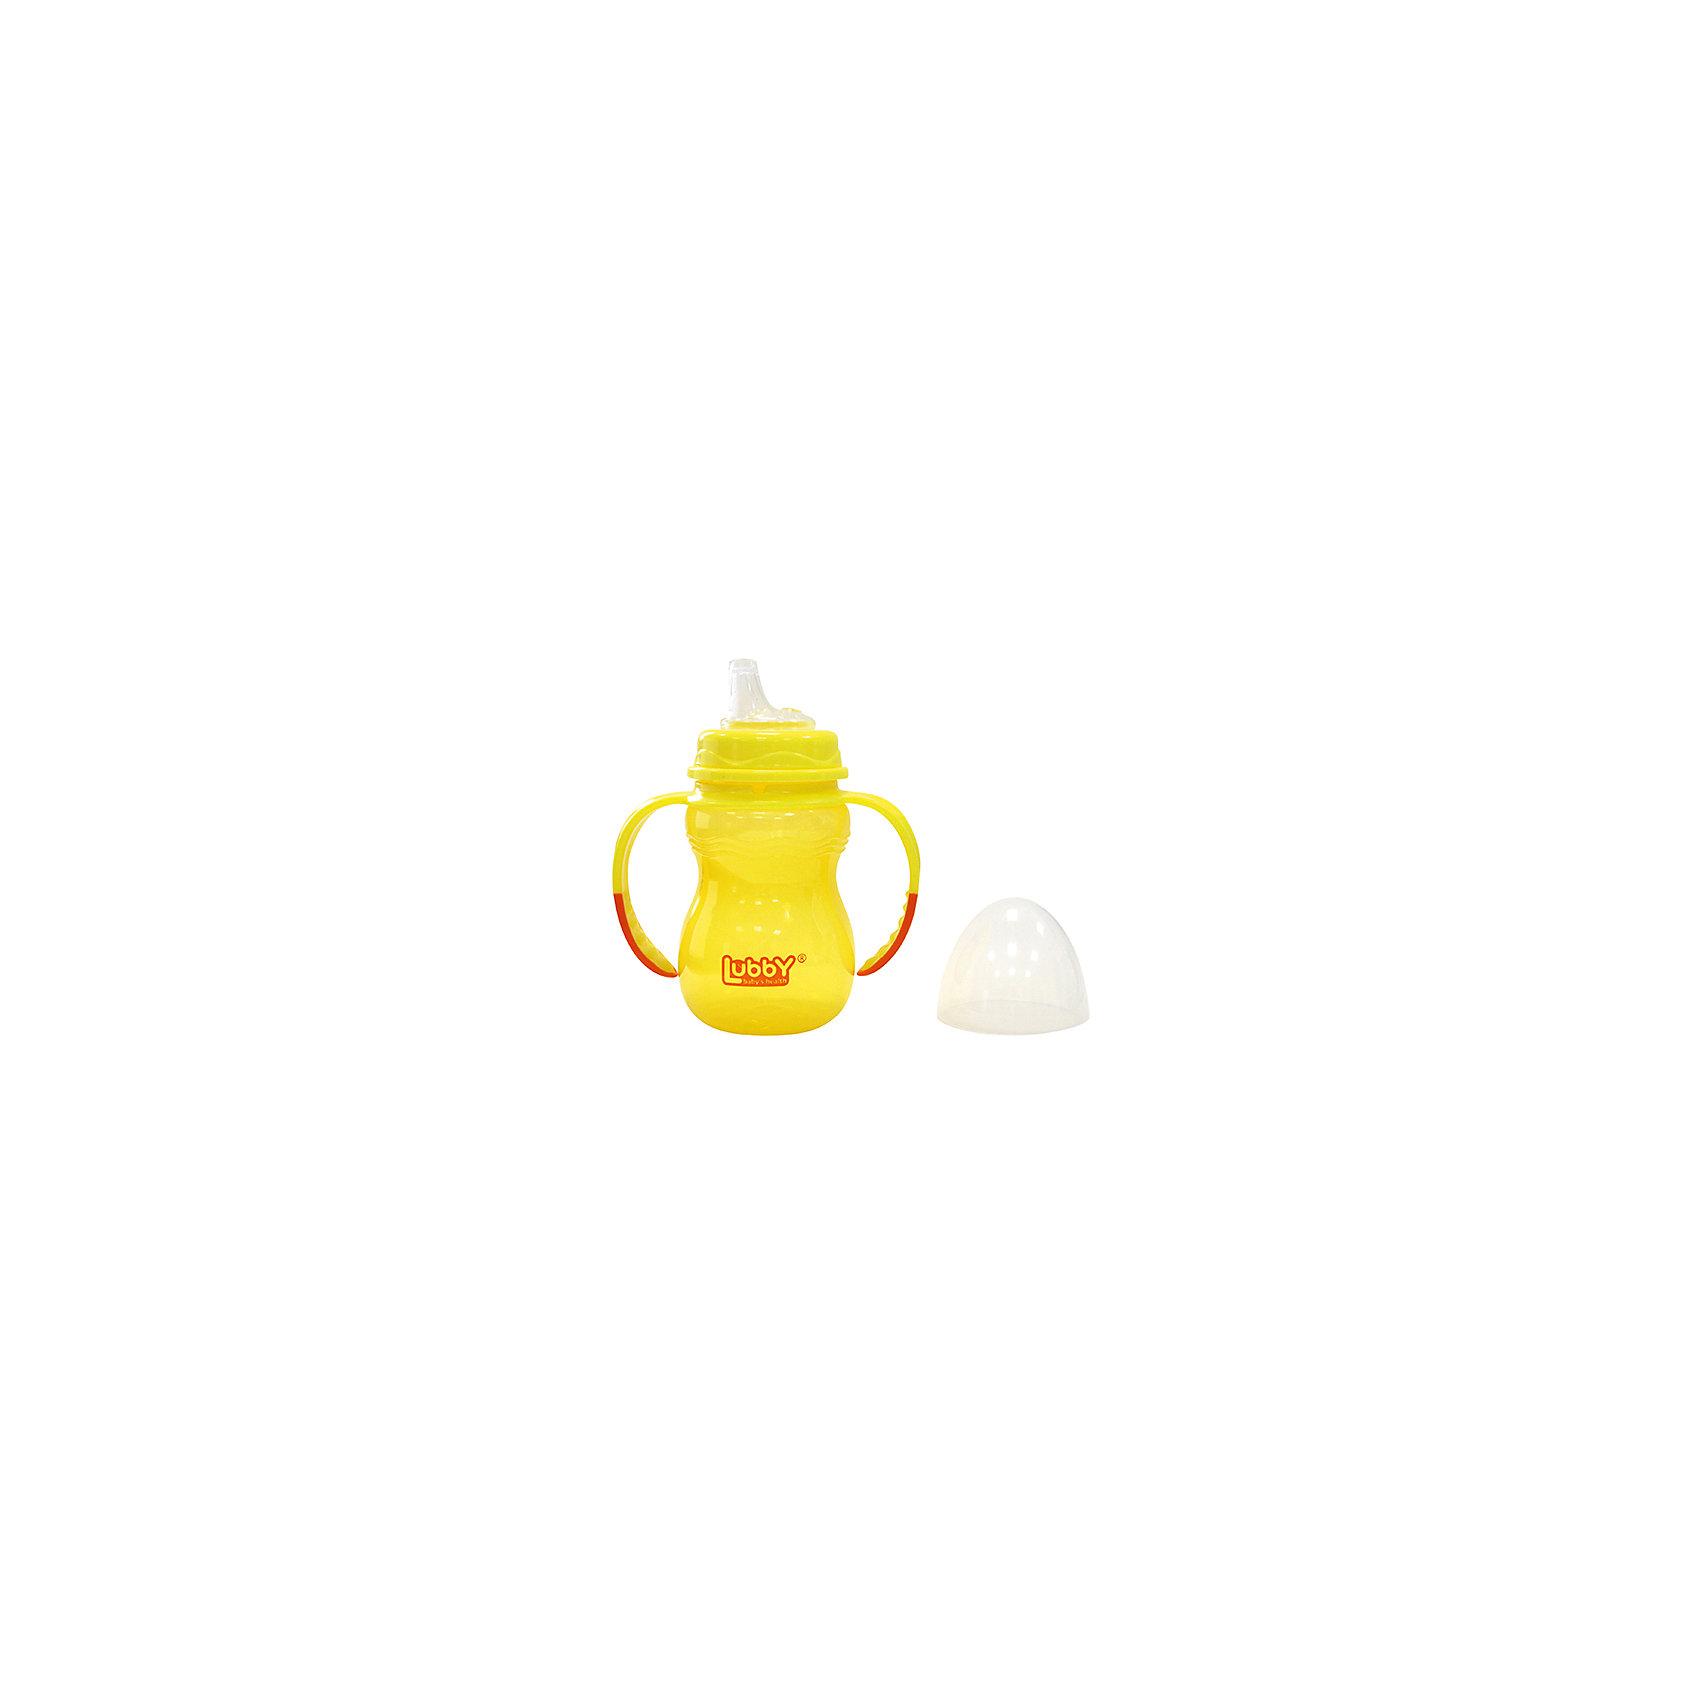 Поильник-непроливайка Классика от 6 мес. 250 мл., LUBBY, жёлтый/оранжевый